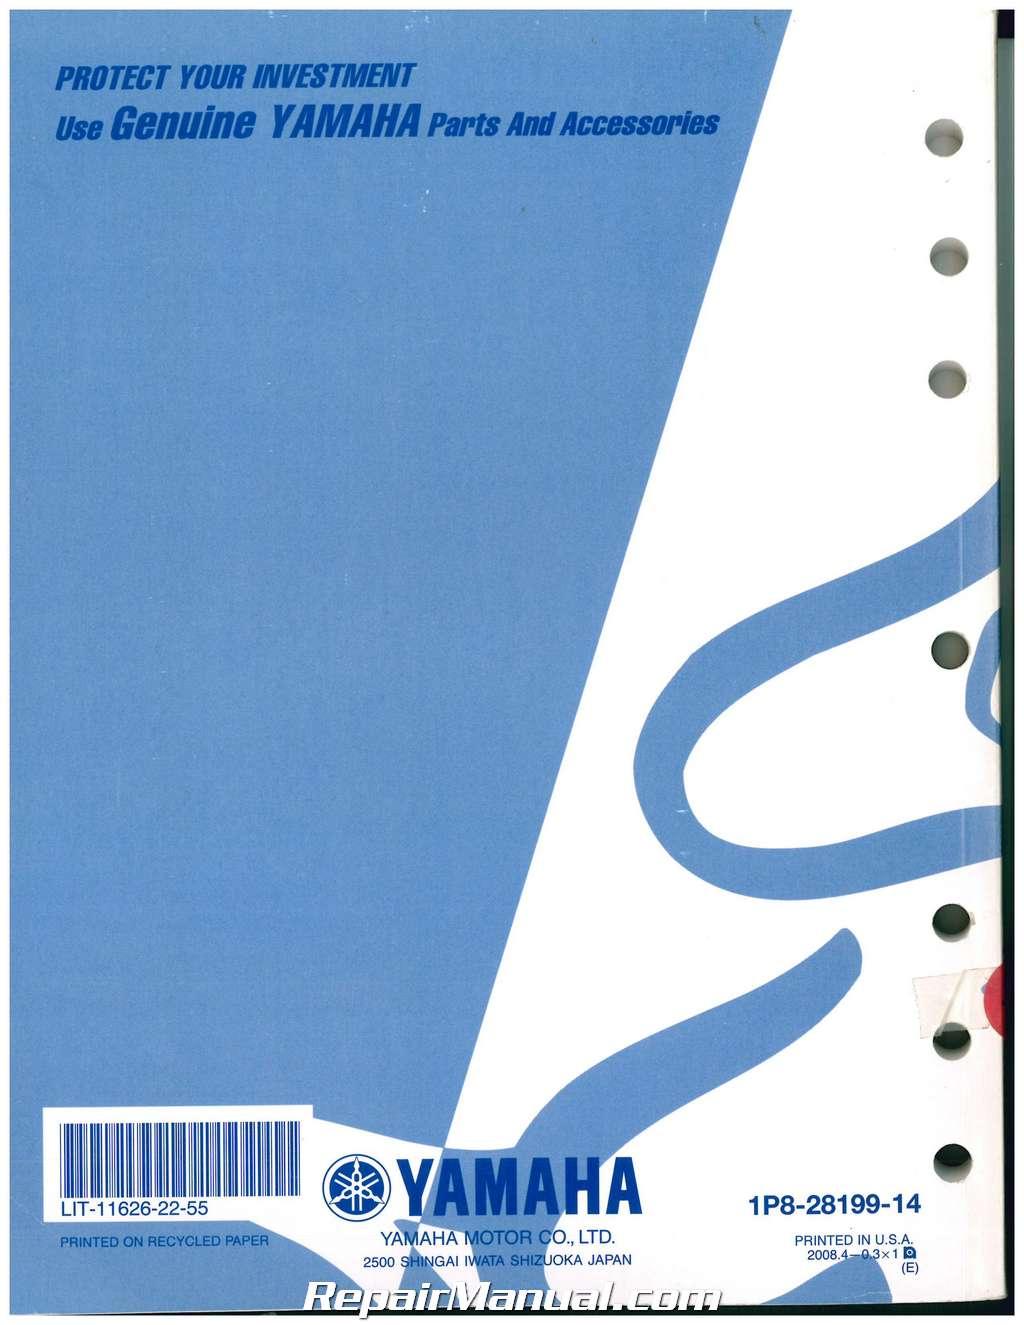 Yamaha Yz Owners Manual